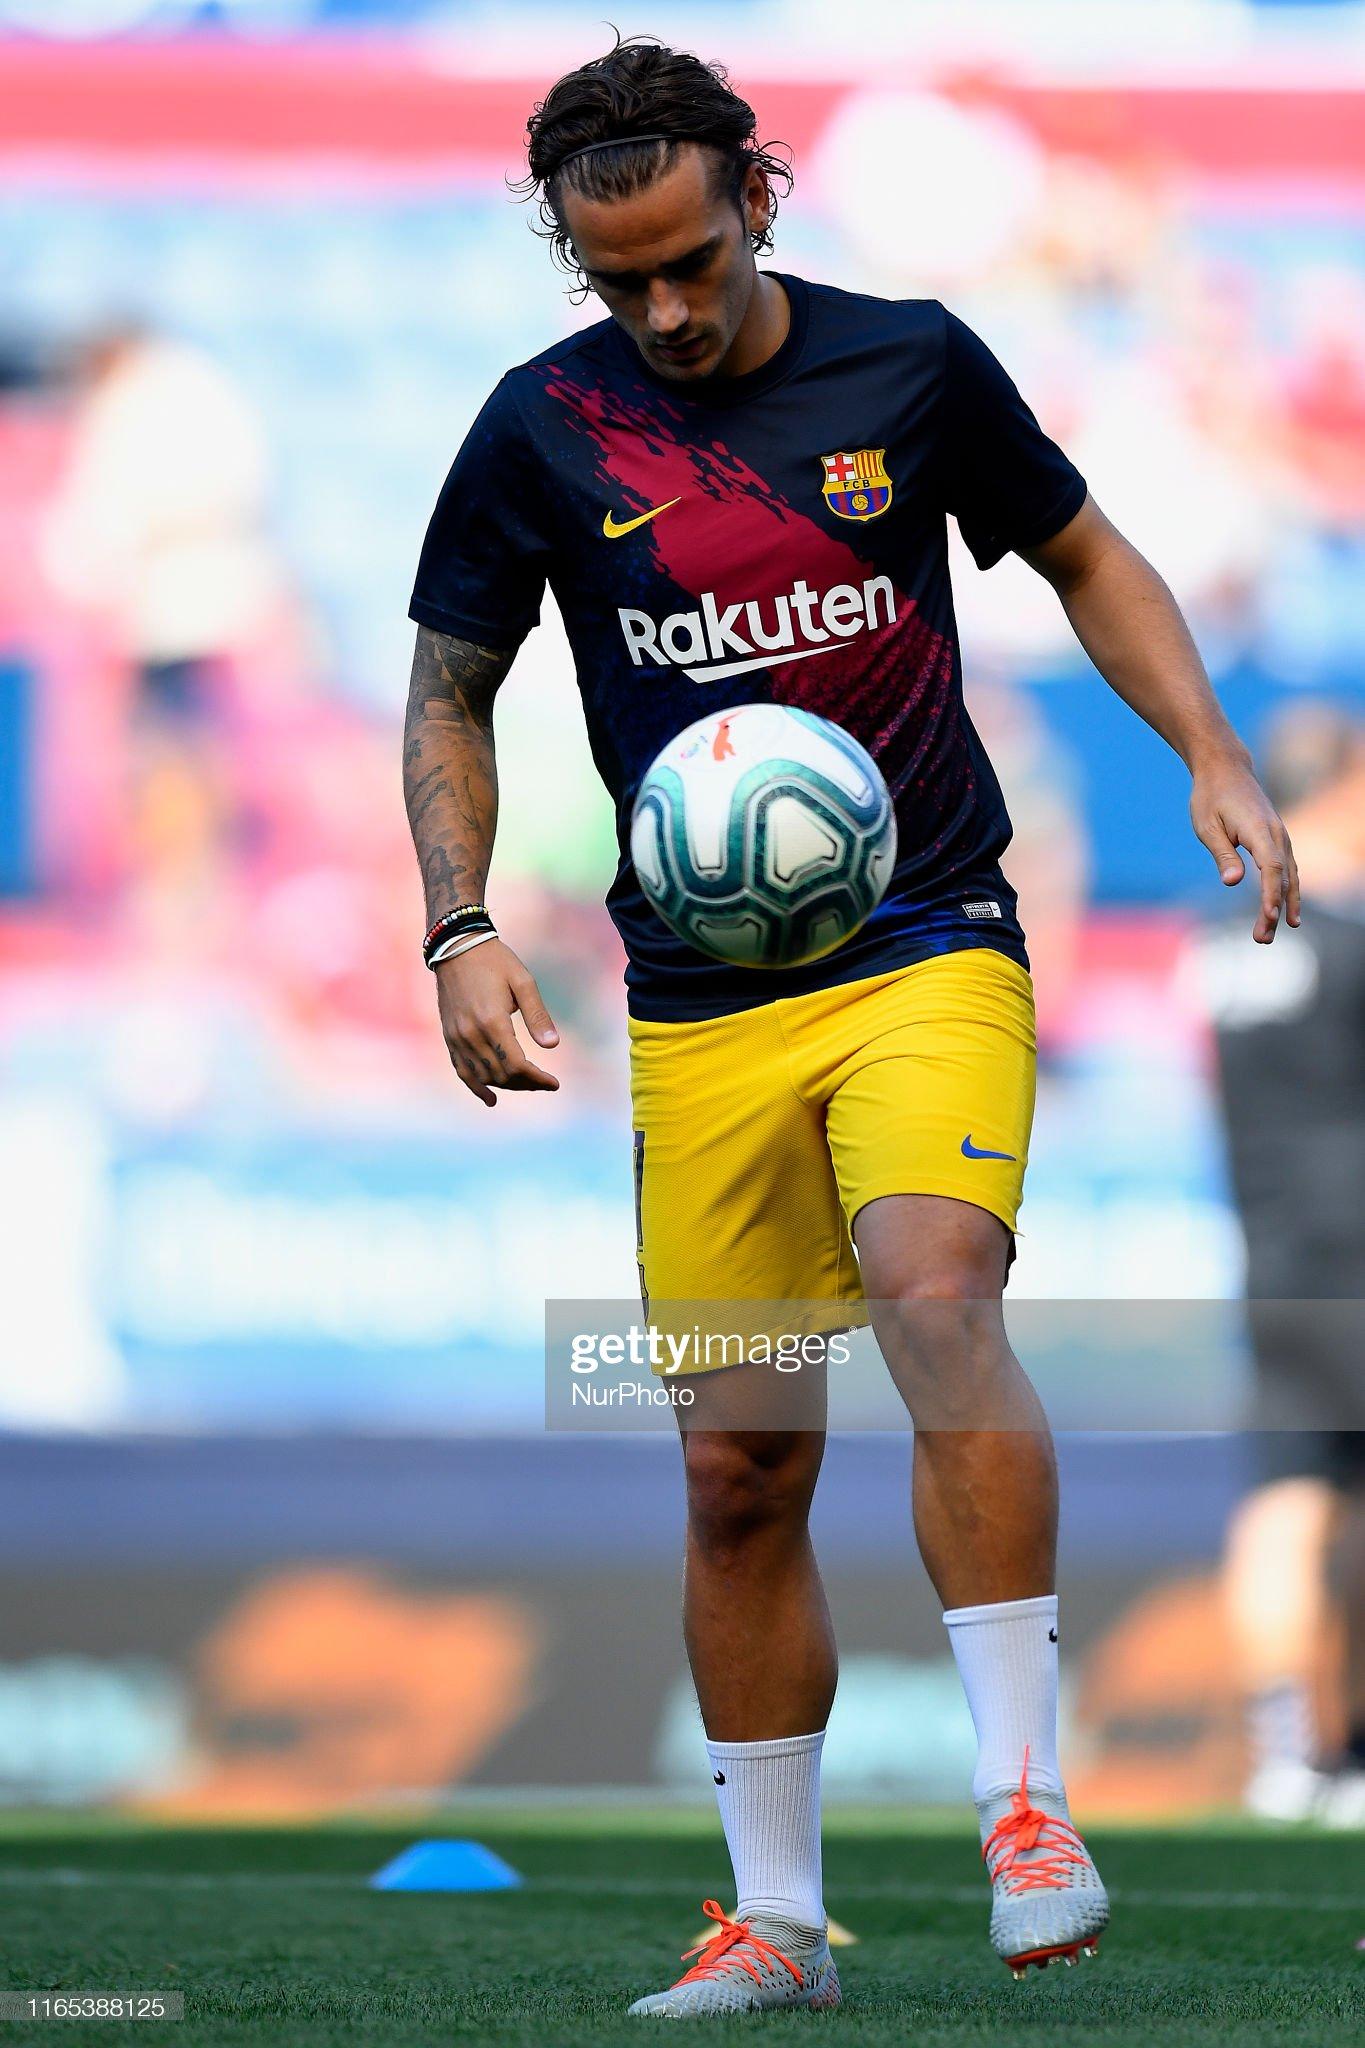 صور مباراة : أوساسونا - برشلونة 2-2 ( 31-08-2019 )  Antoine-griezmann-of-barcelona-during-the-warmup-before-the-liga-ca-picture-id1165388125?s=2048x2048